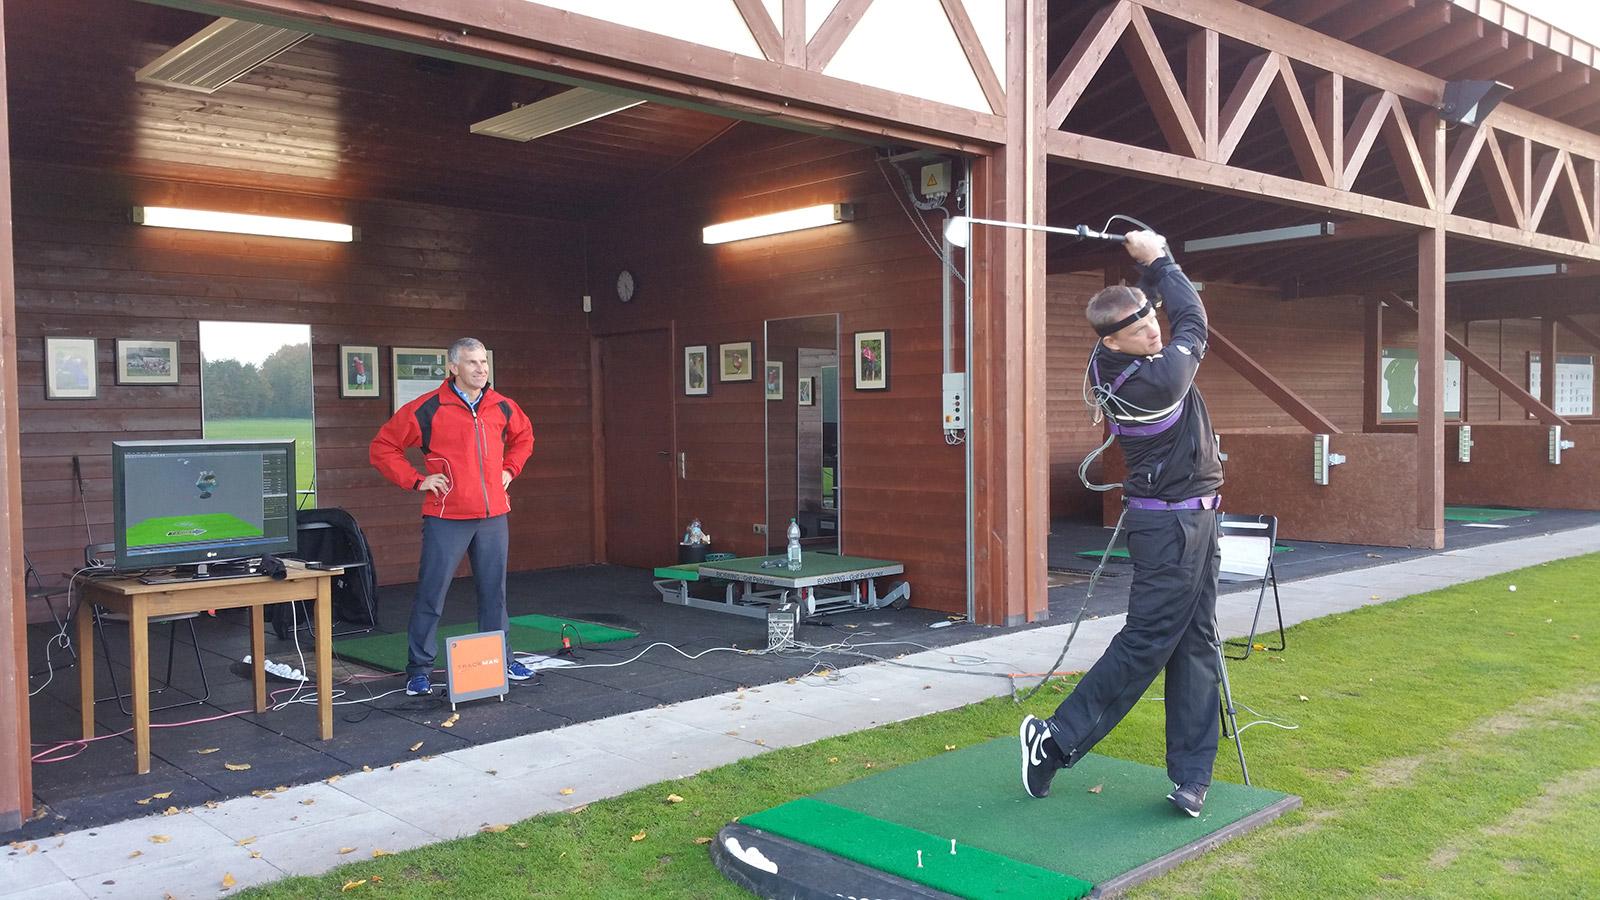 Improve Your Golf Swing through 3D Technology